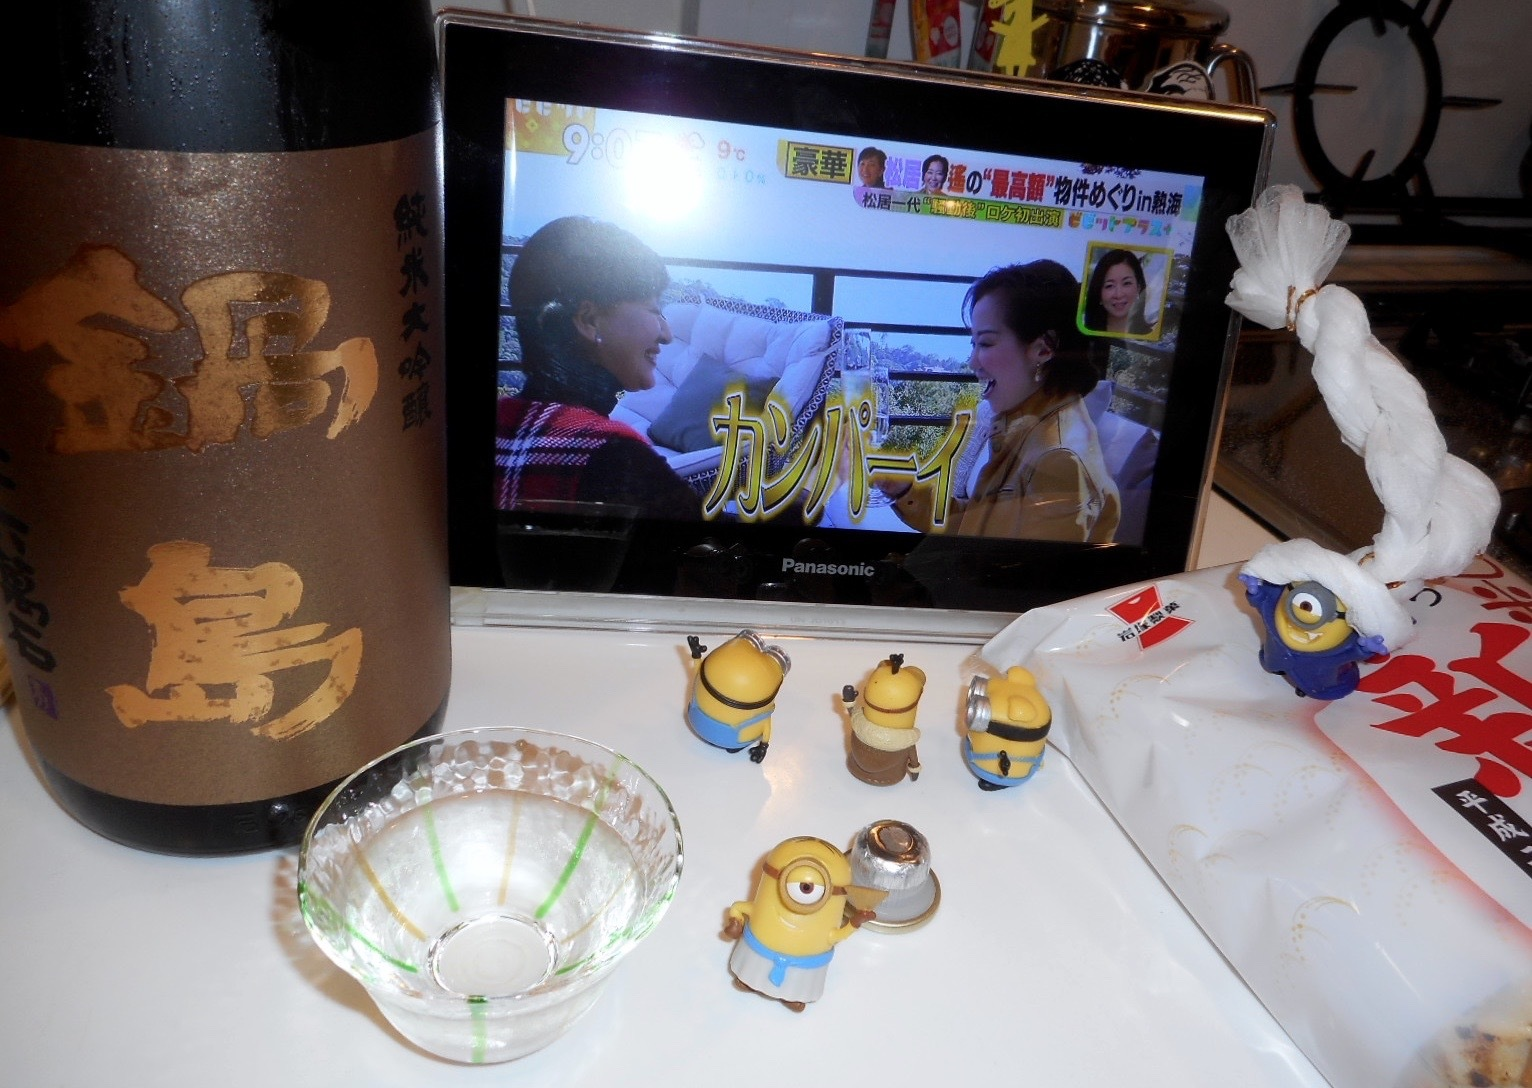 nabeshima_jundai_yoshikawa28by16.jpg